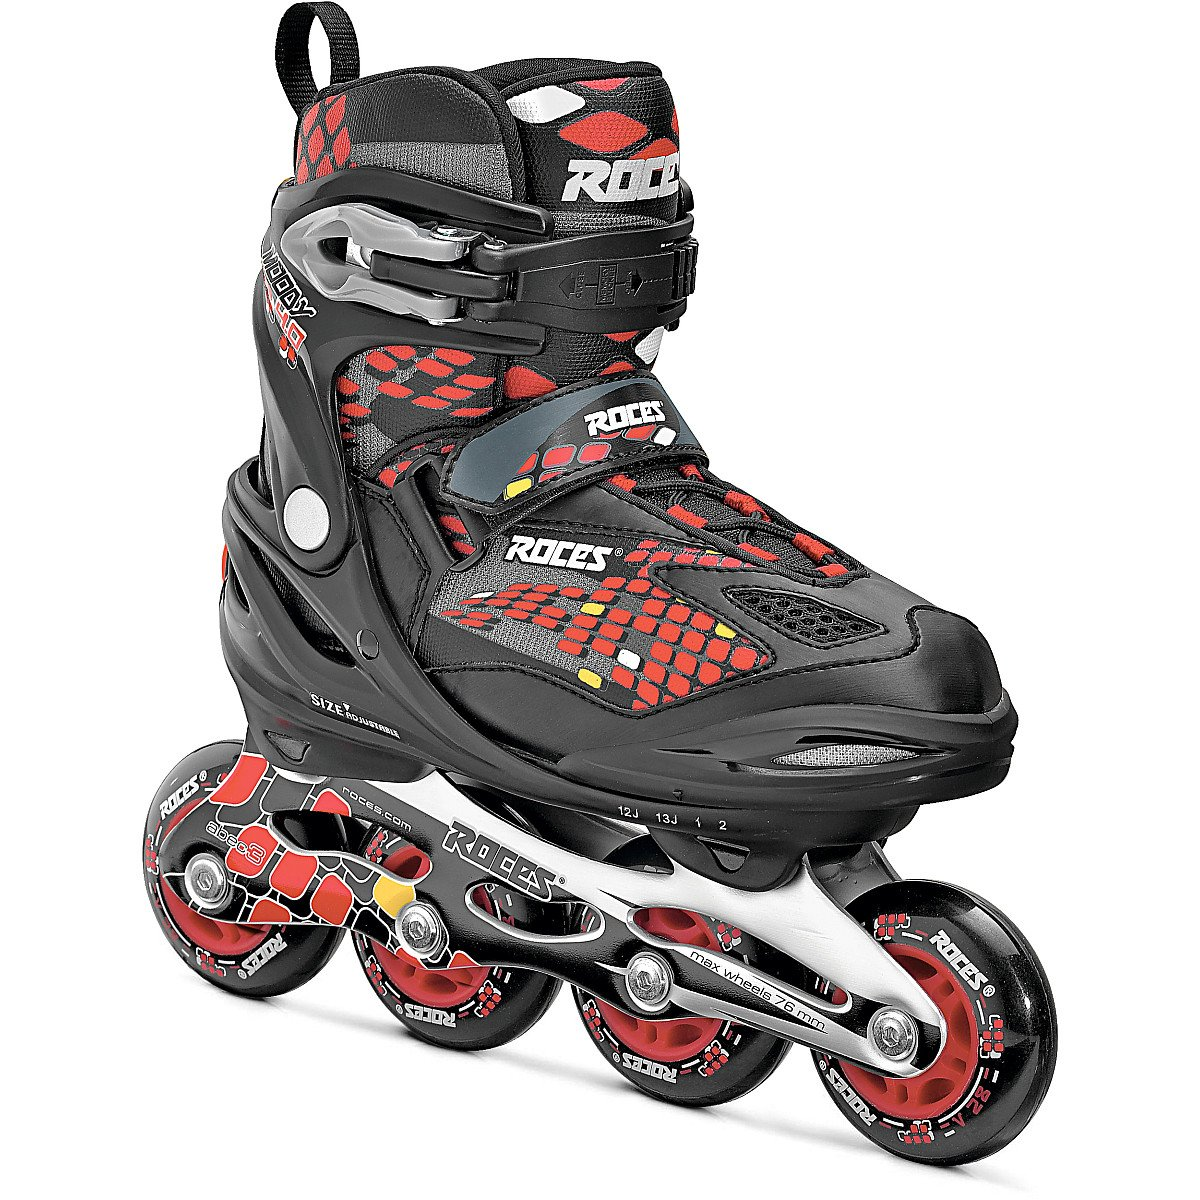 Roces 400792 Men's Model Moody 4.0 Adjustable Inline Skate, US 13jr-3, Black/Astro Blue/Red